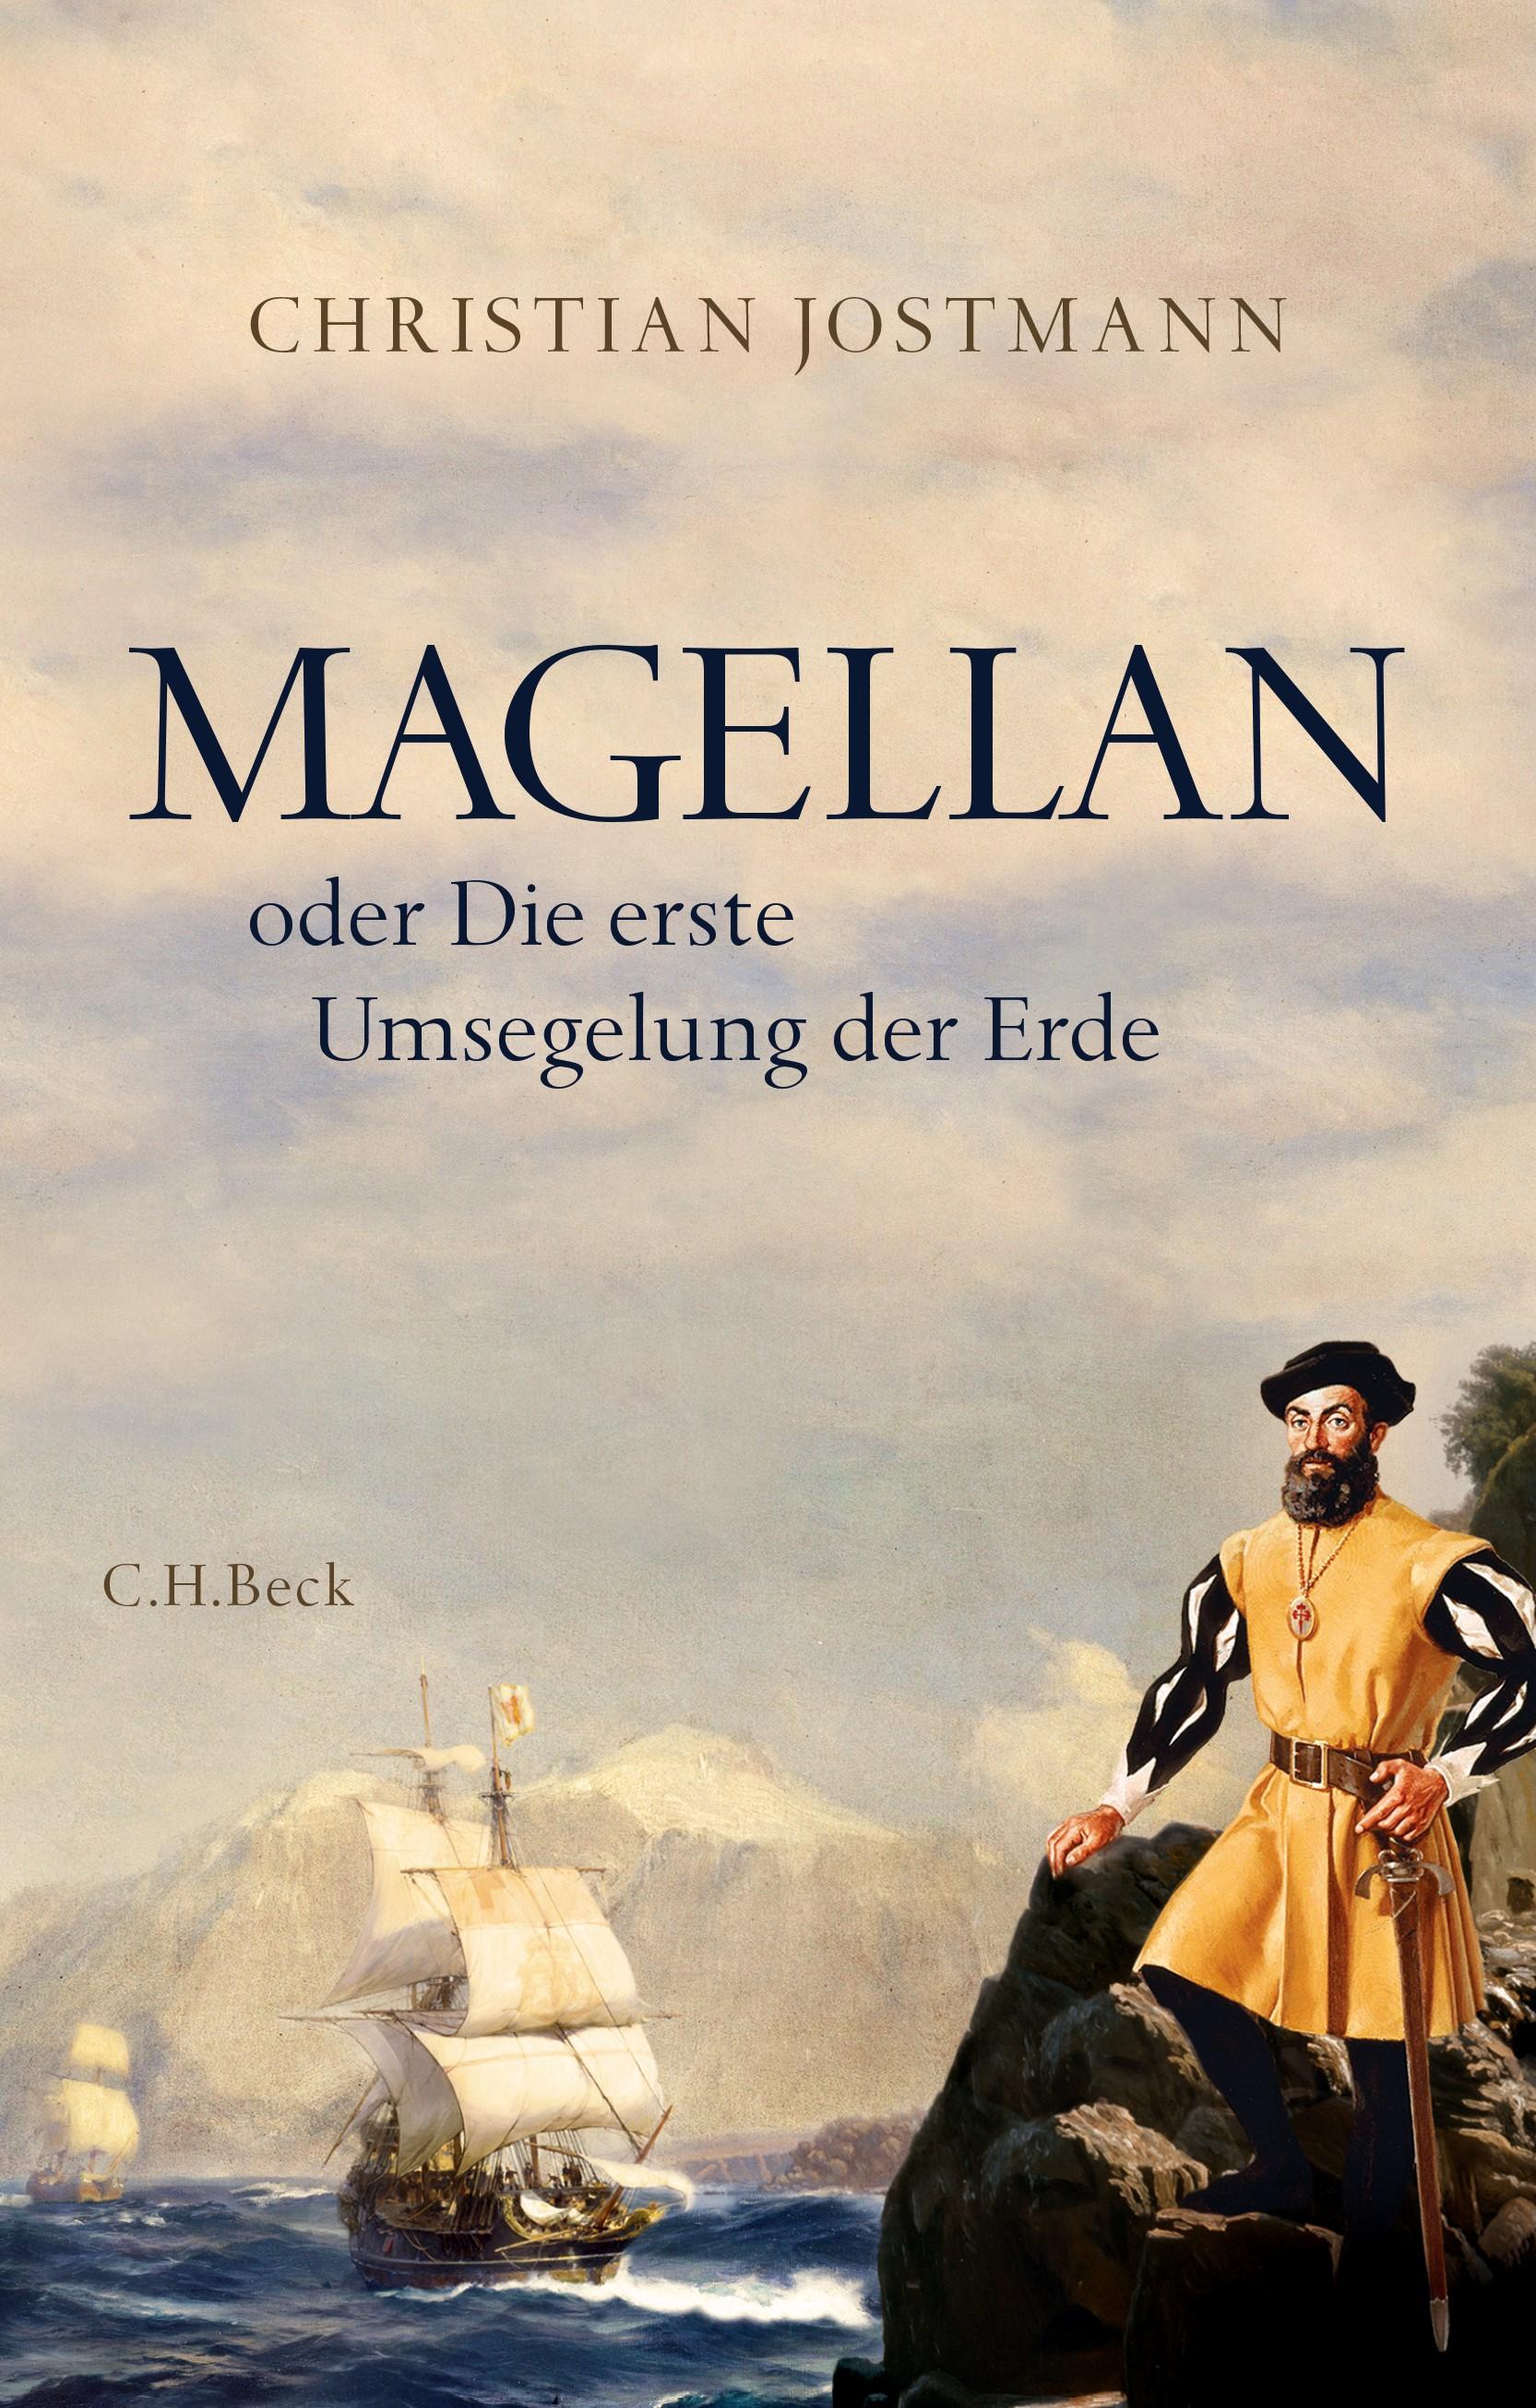 Magellan | Jostmann, Christian, 2019 | Buch (Cover)